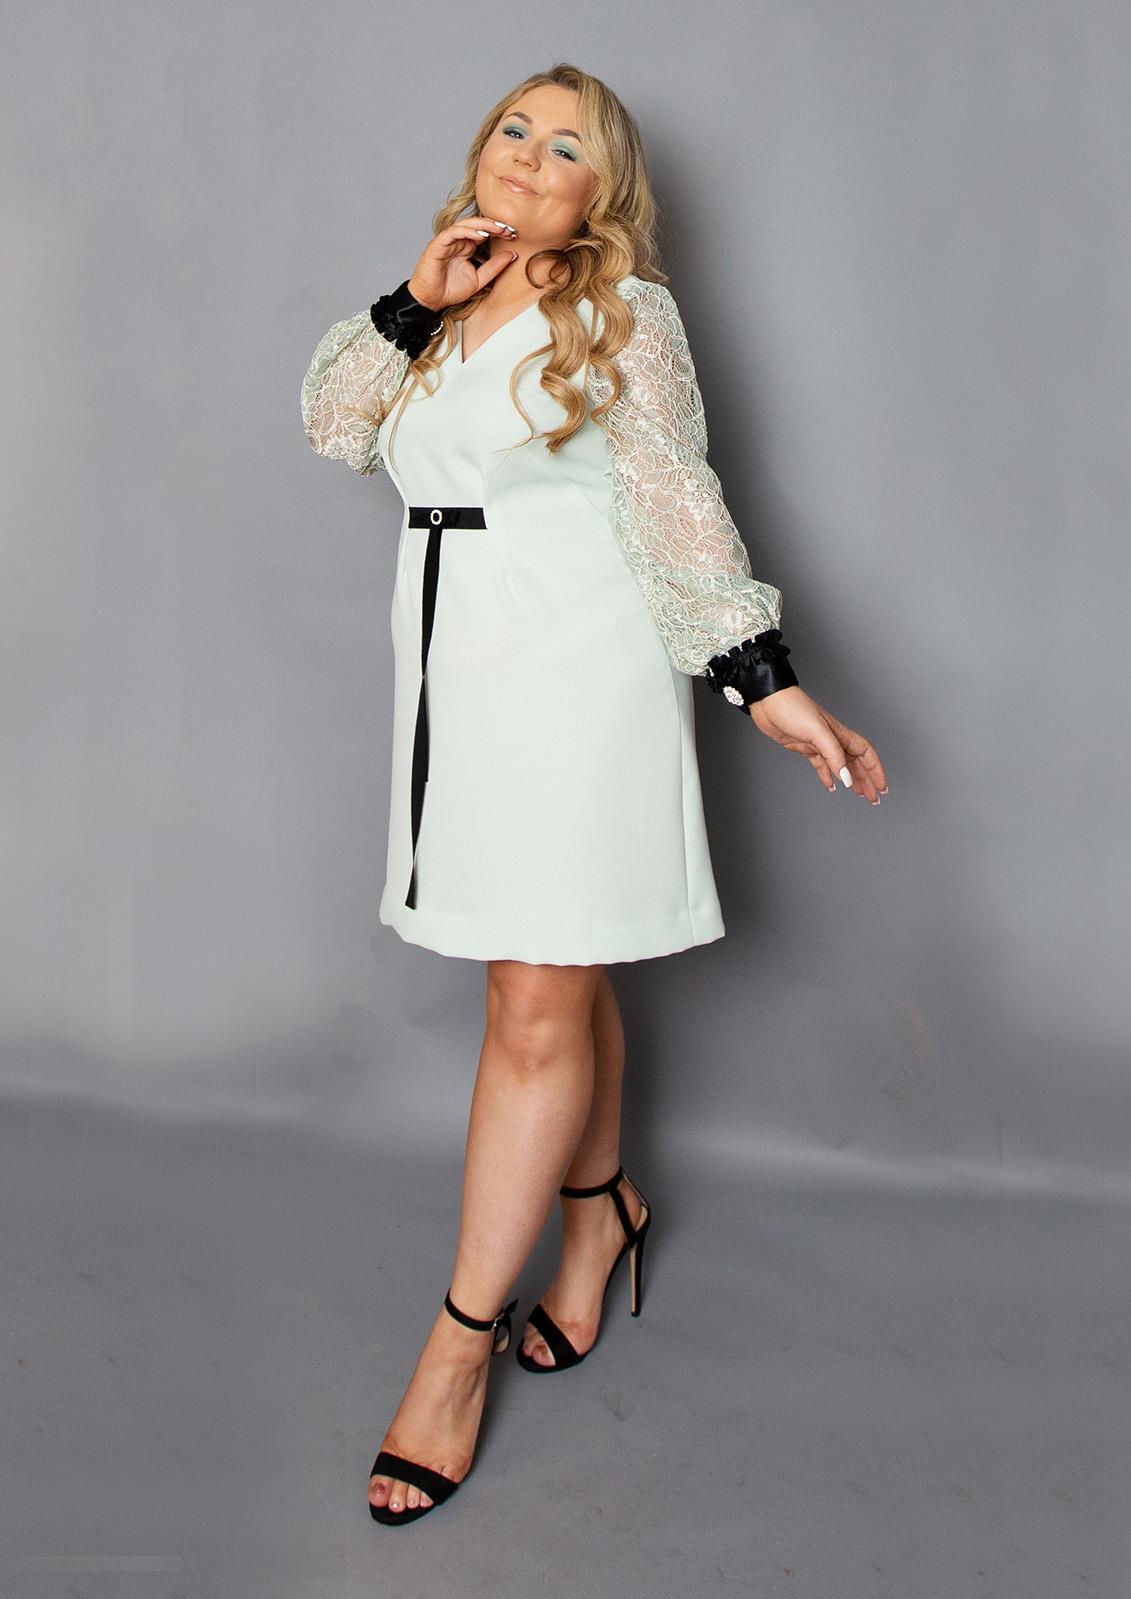 Contact | Zobi Fashion Design Consultancy